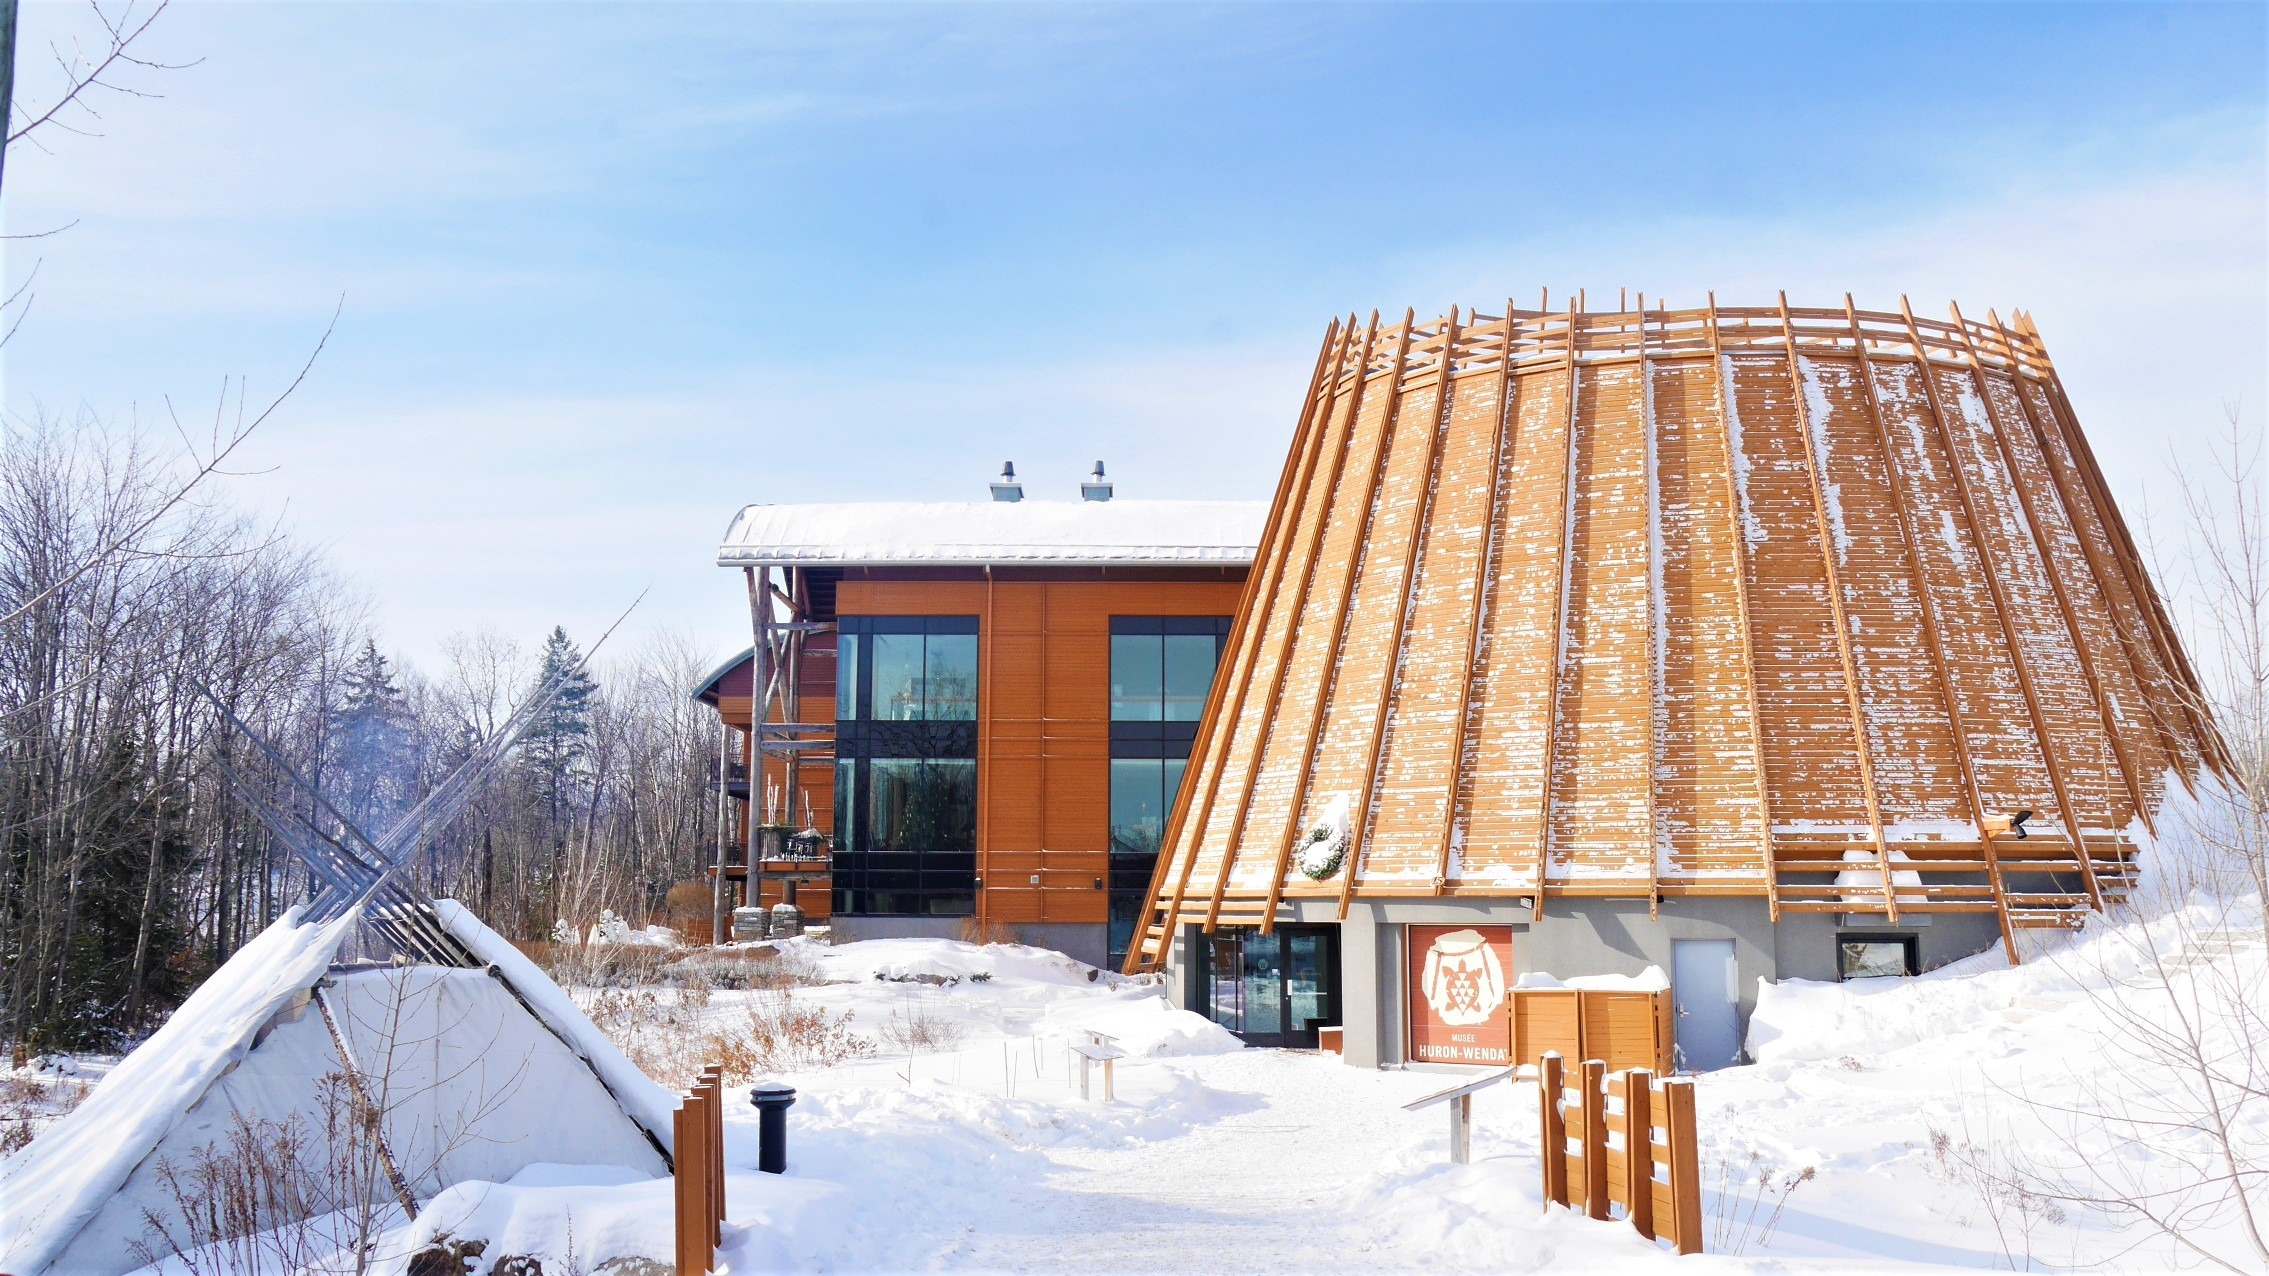 Quebec Noel Wendake que voir infos pratiques blog voyage canada hiver arpenter le chemin